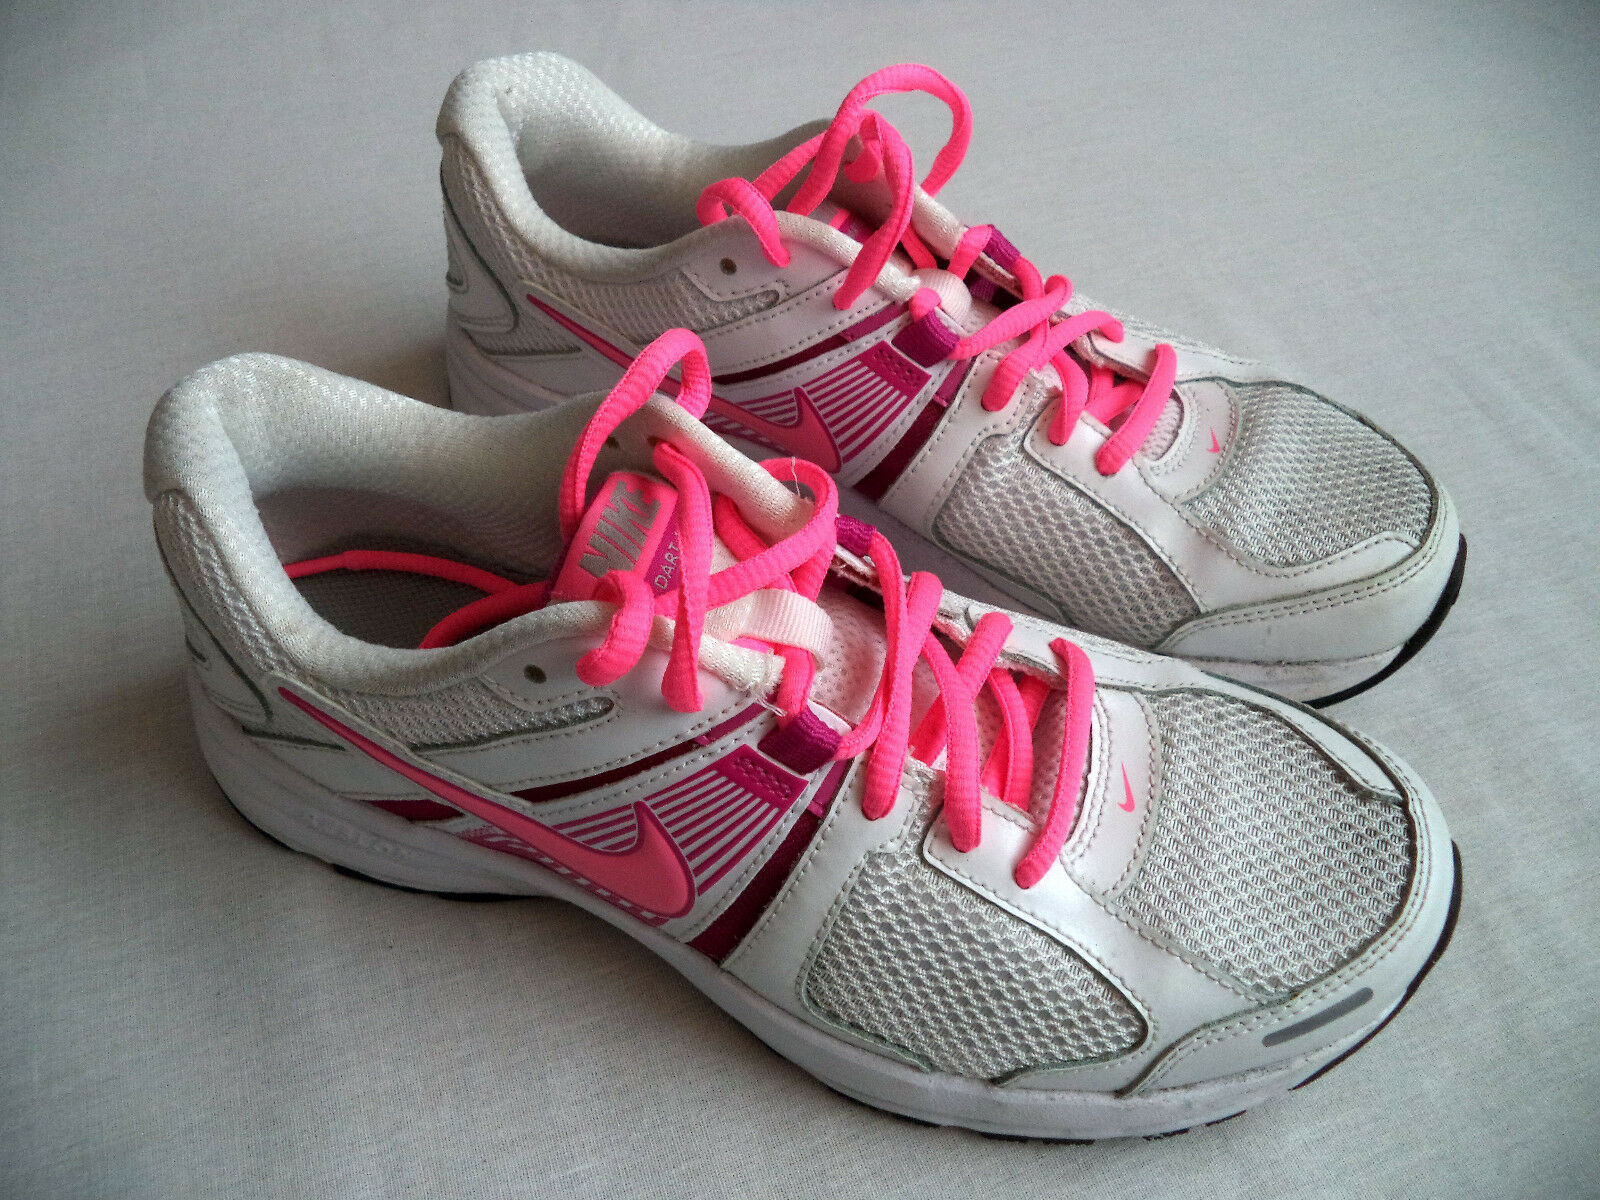 Womens NIKE Dart Dart Dart 10 running shoes sz 8 fitness gym athletic workout training 39560c